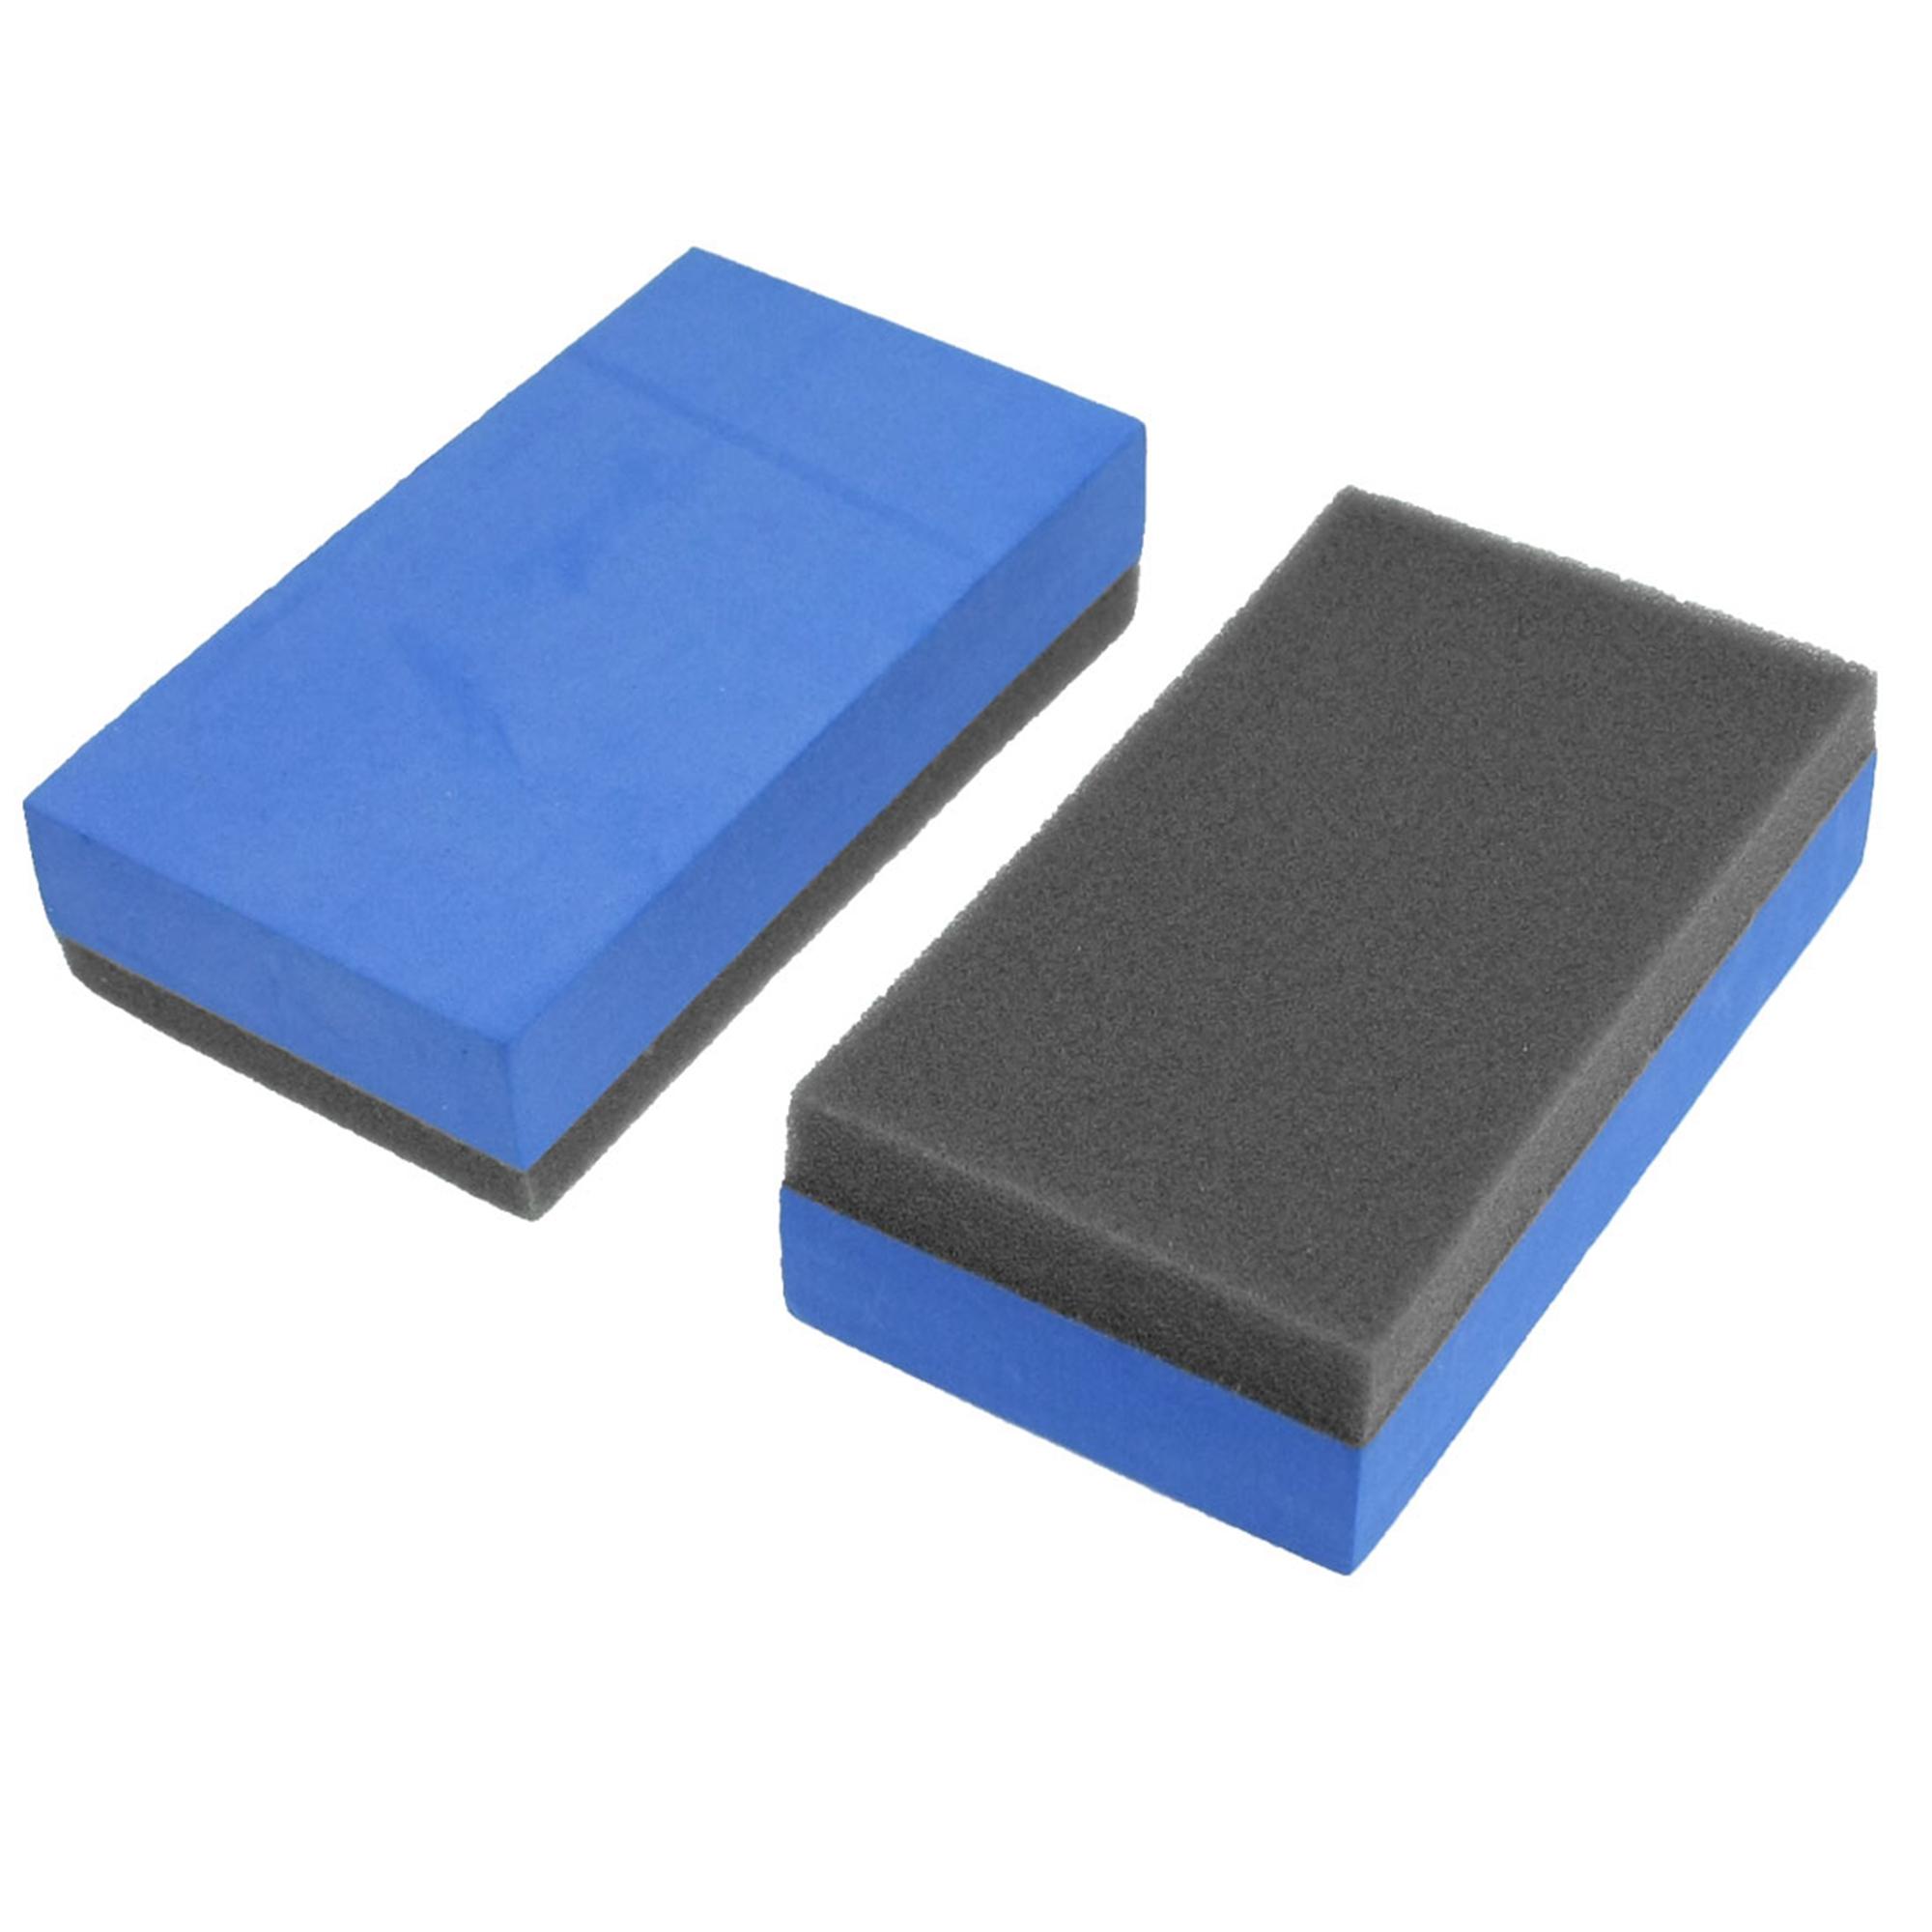 Home Car Truck Wash Foam Sponge Block Cleaner Tool Blue Gray 2 Pcs